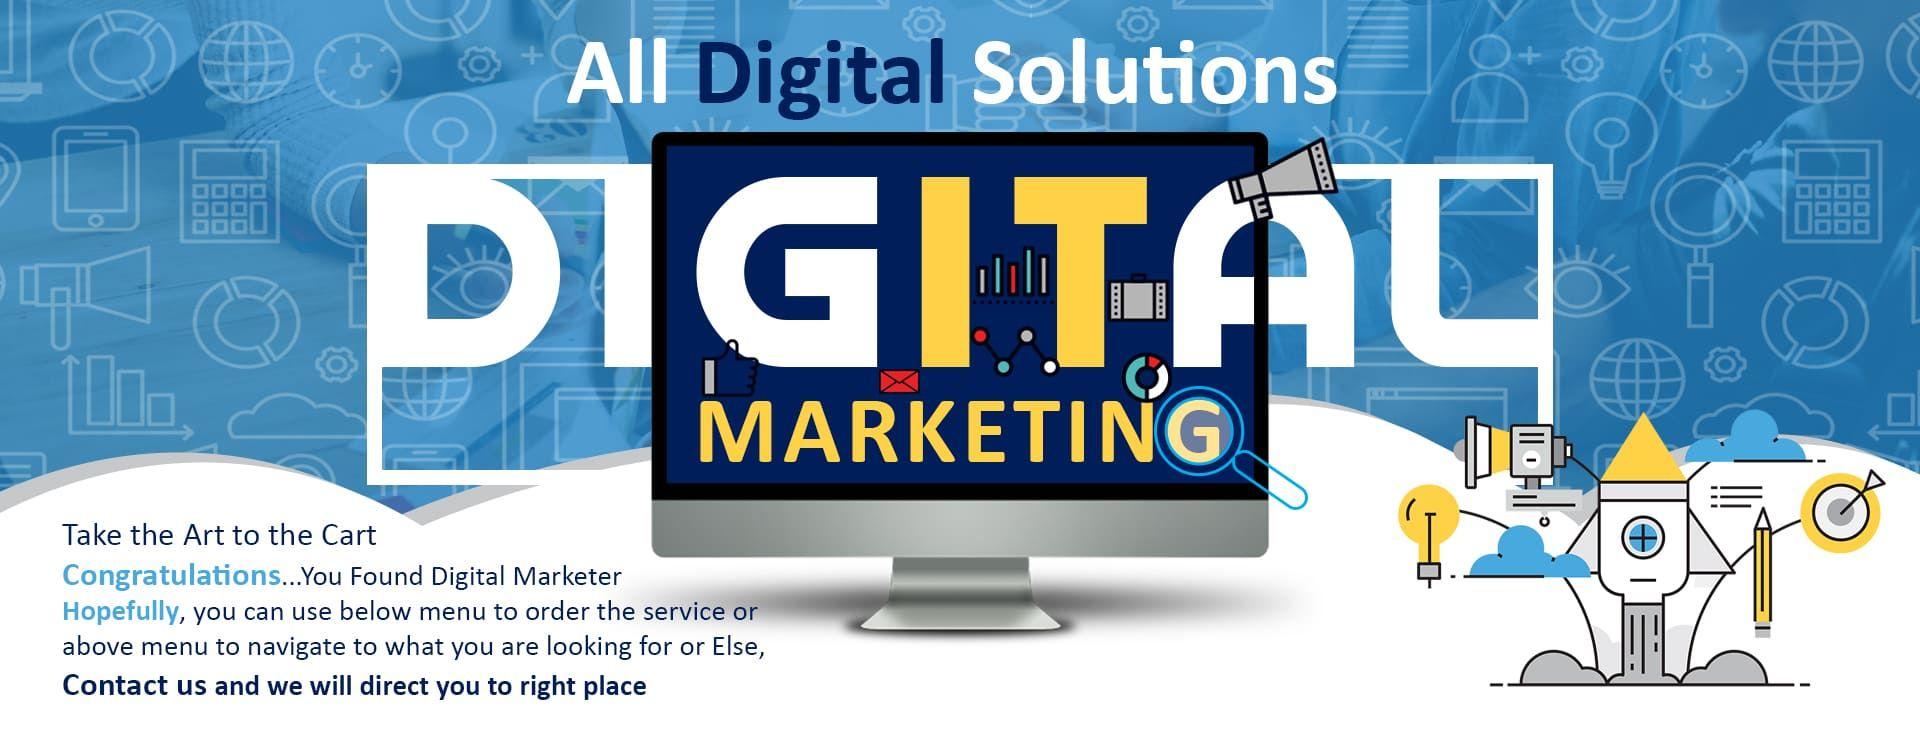 Best Web Design And Development Software Development Email Marketing Sms Marketing Digital Marketing Comp Web Development Design Web Design Sms Marketing